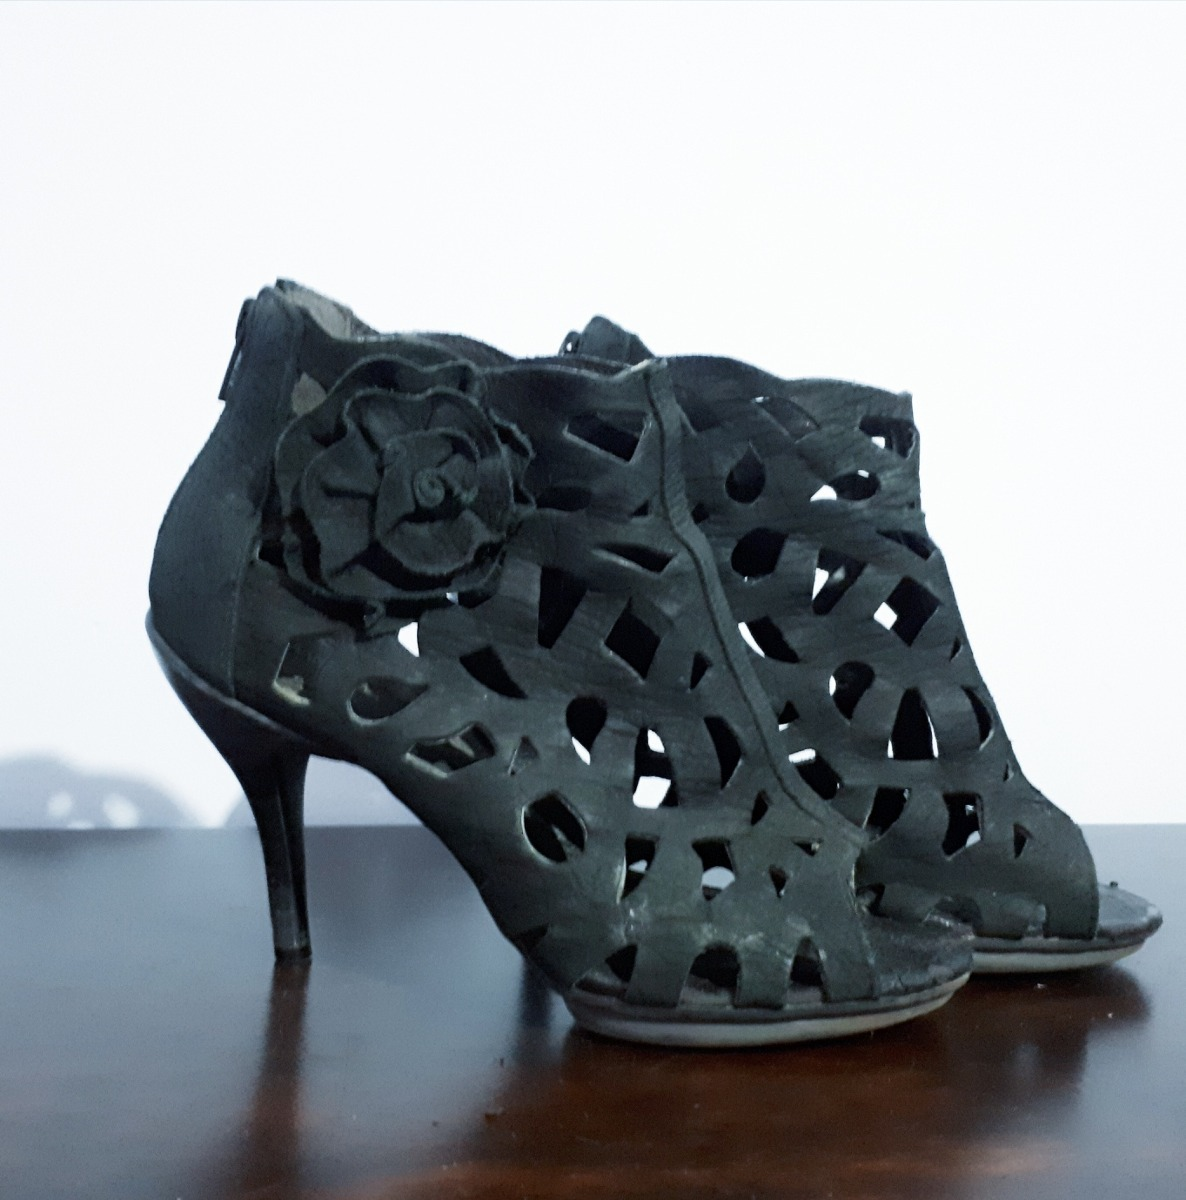 e175ee09d Ankle Boot Ramarim Total Comfort - R$ 35,00 em Mercado Livre